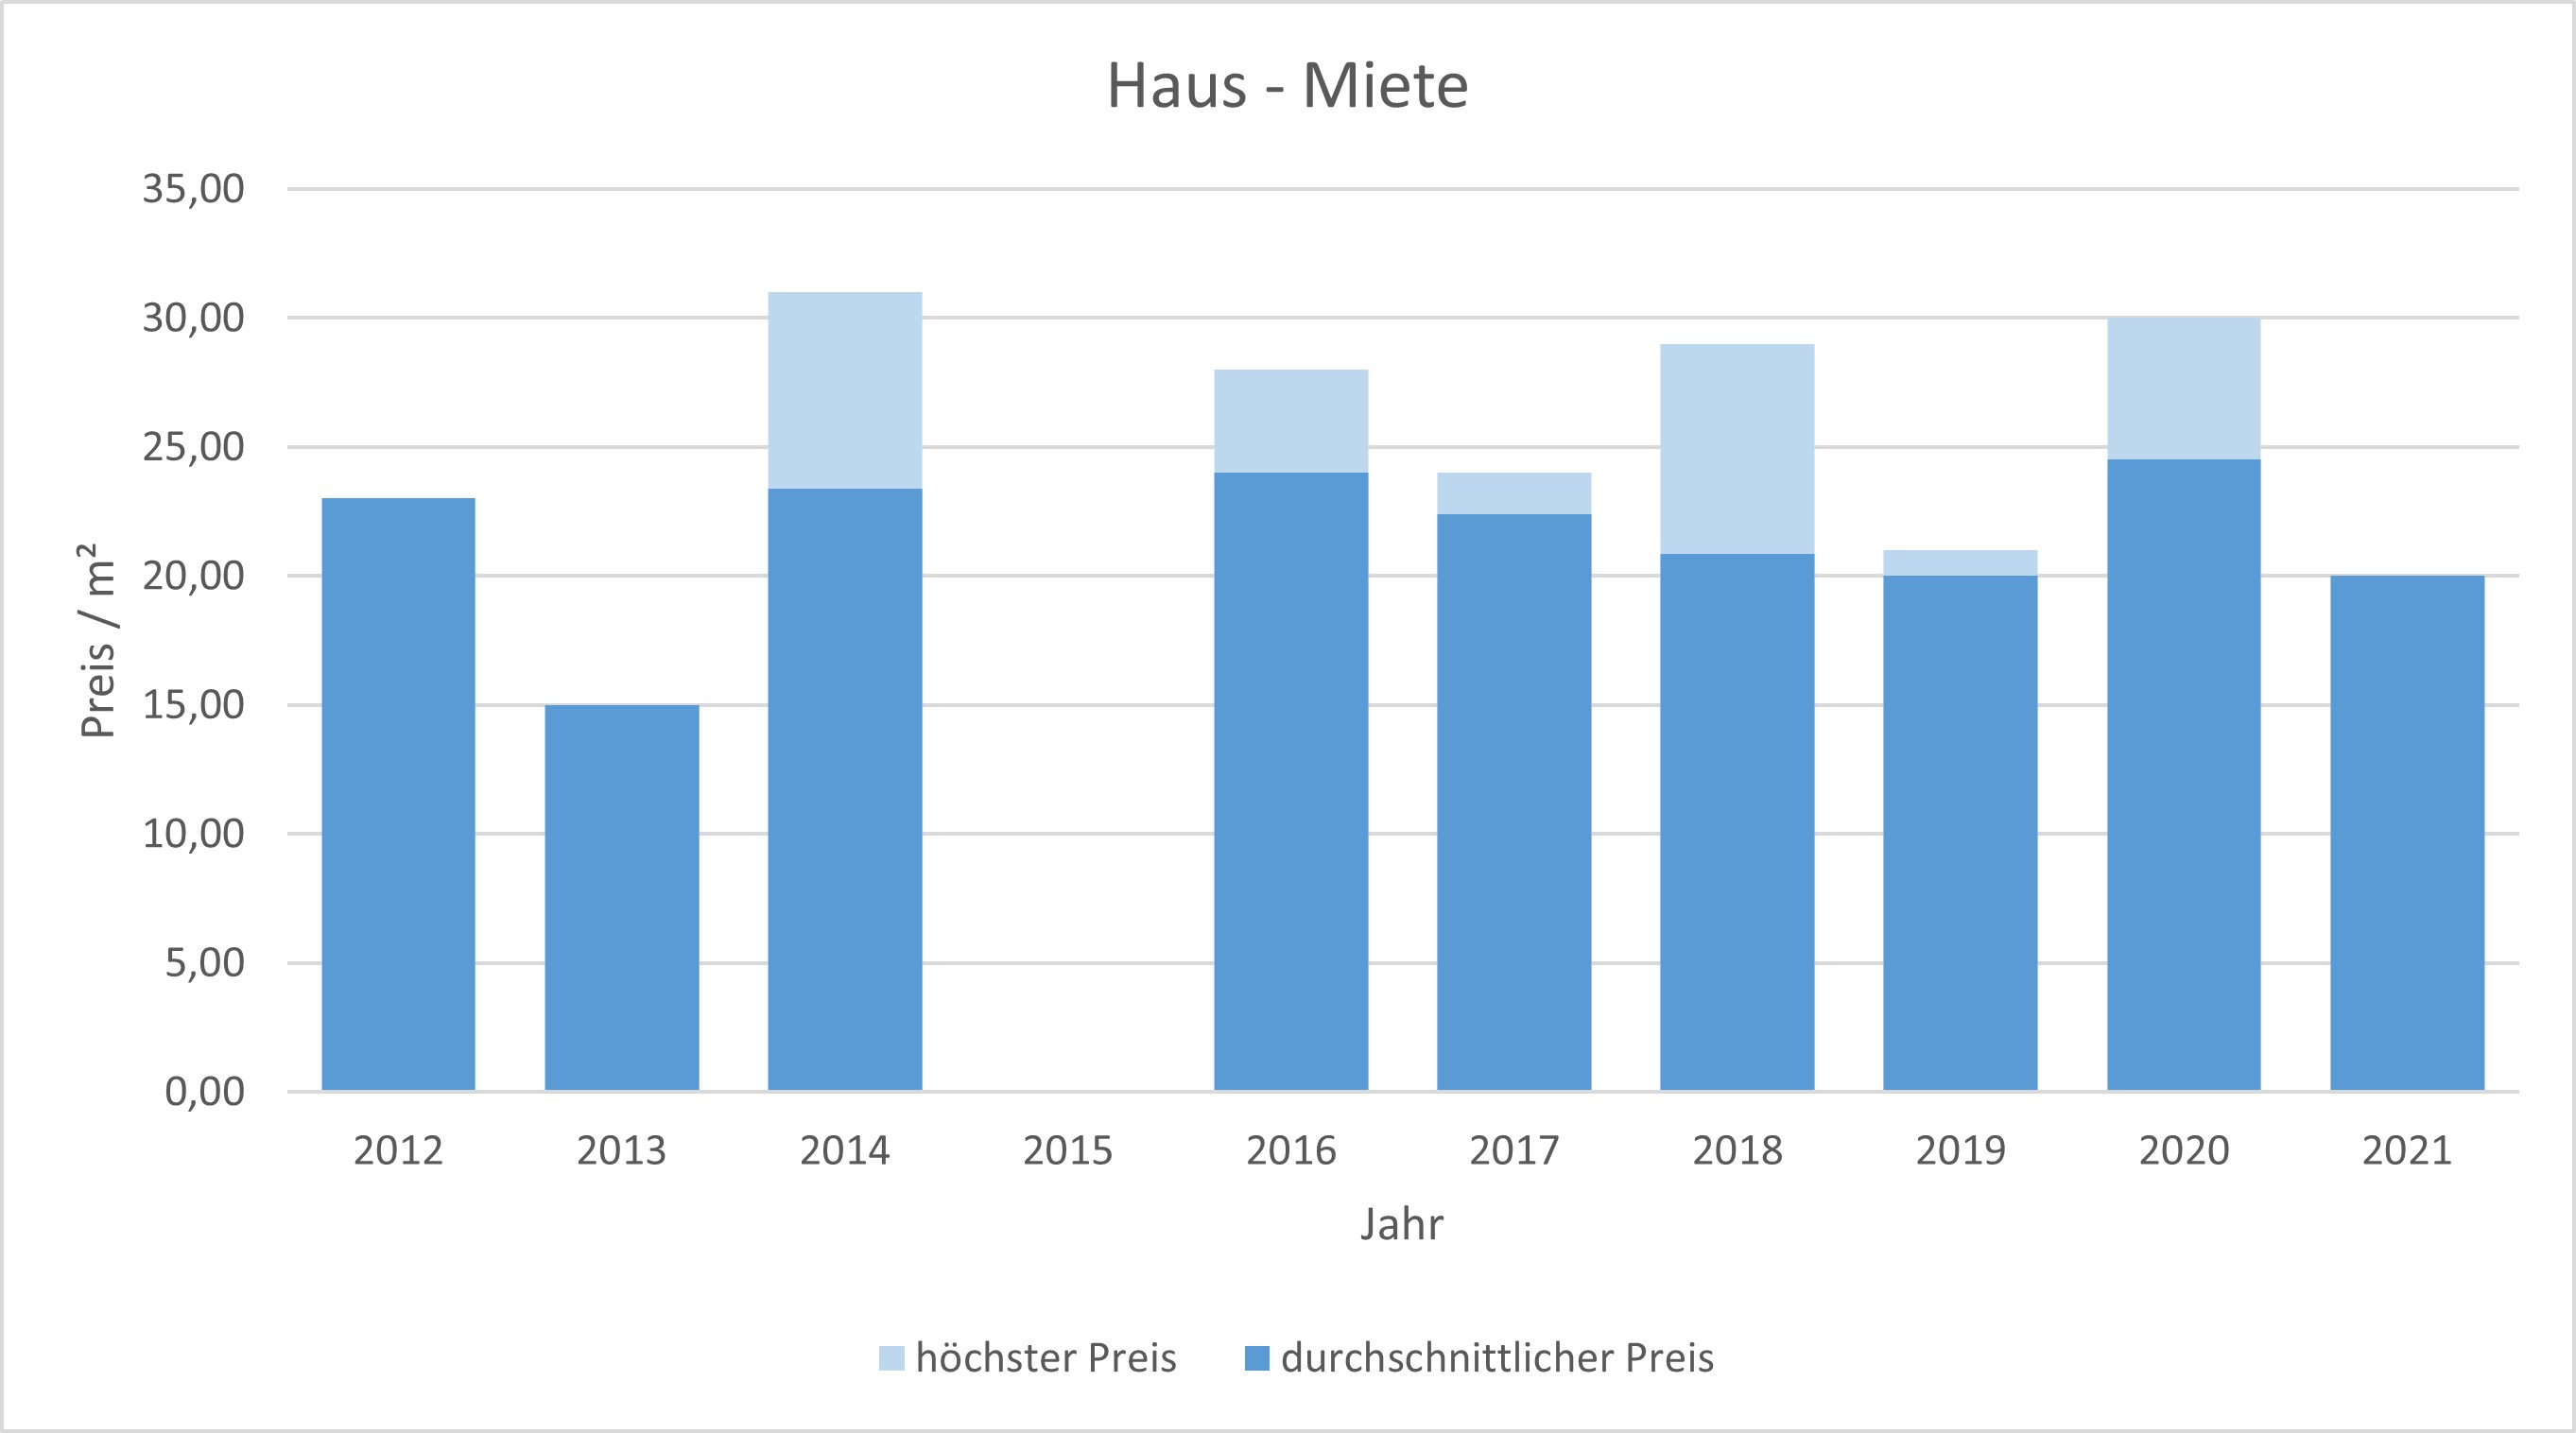 München - Gern Haus mieten vermieten Preis Bewertung Makler www.happy-immo.de 2019 2020 2021